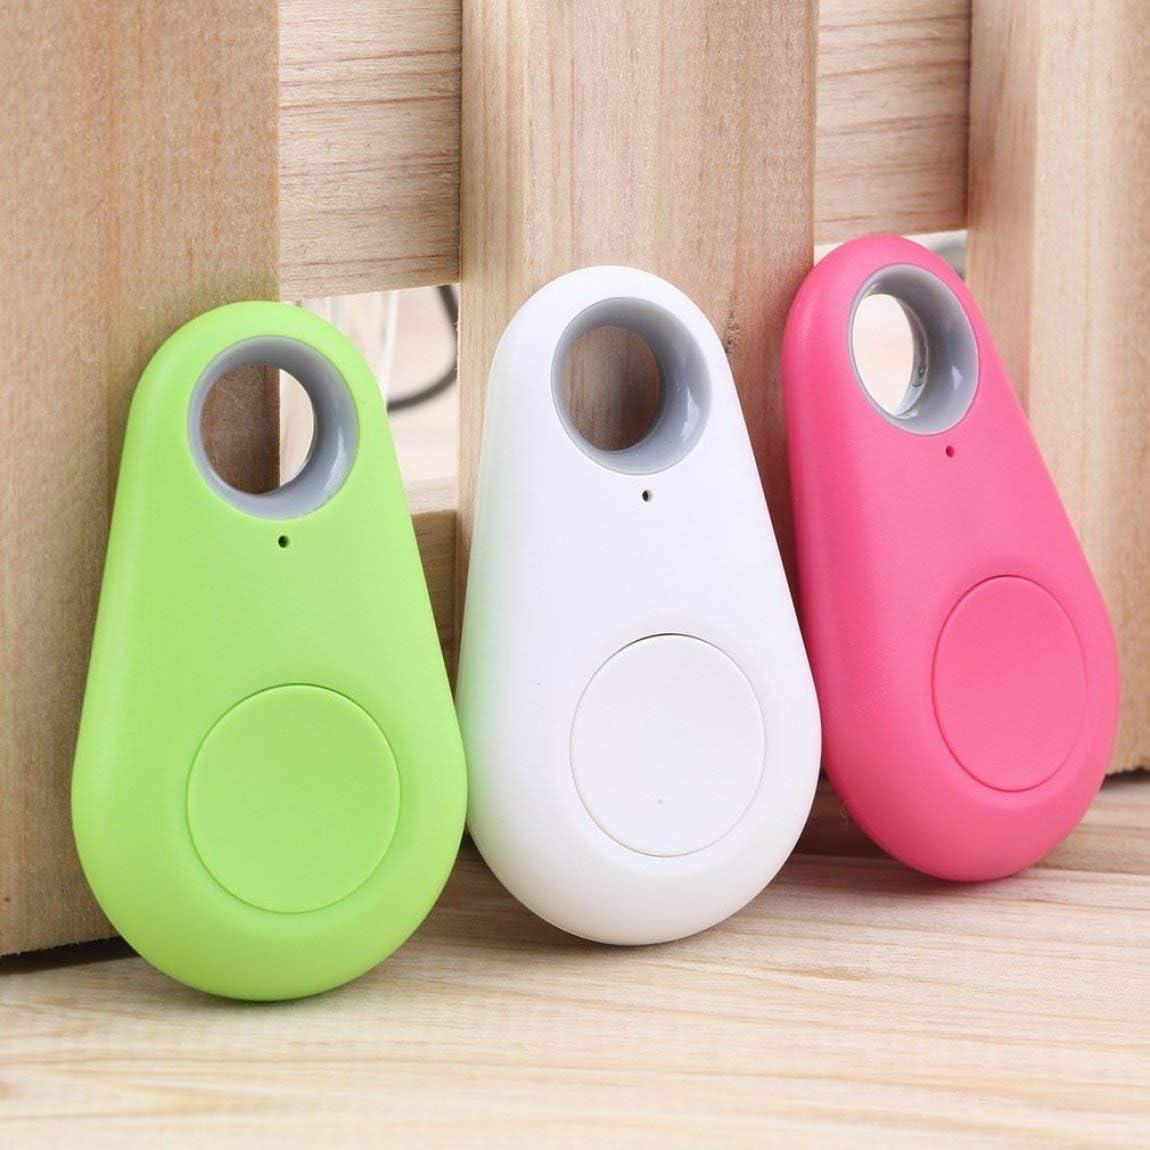 Deniseonuk Mini Fashion 4.0 Tracker Locator Tag Alarm Wallet Key Pet Dog Tracker Anti-lost Pocket Size Smart Tracker